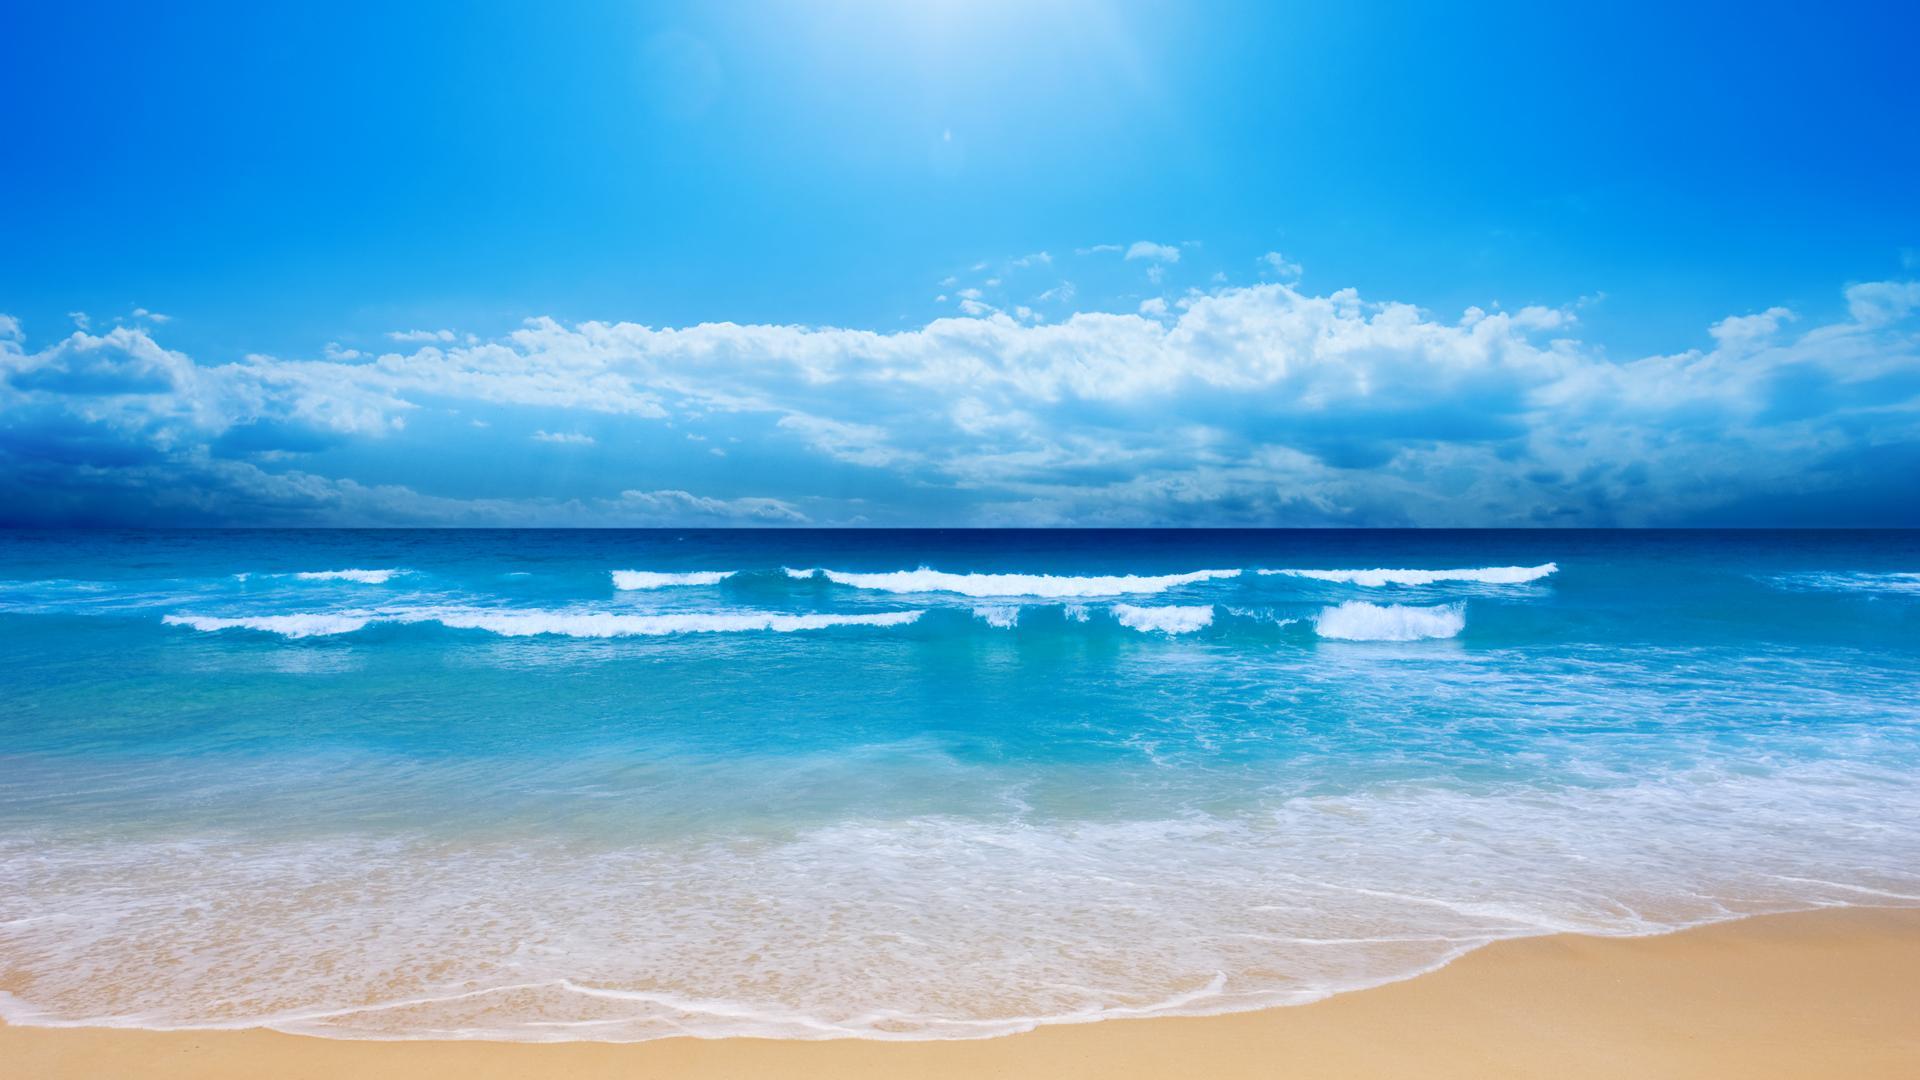 ocean sun sunshine water clouds wow 1920x1080